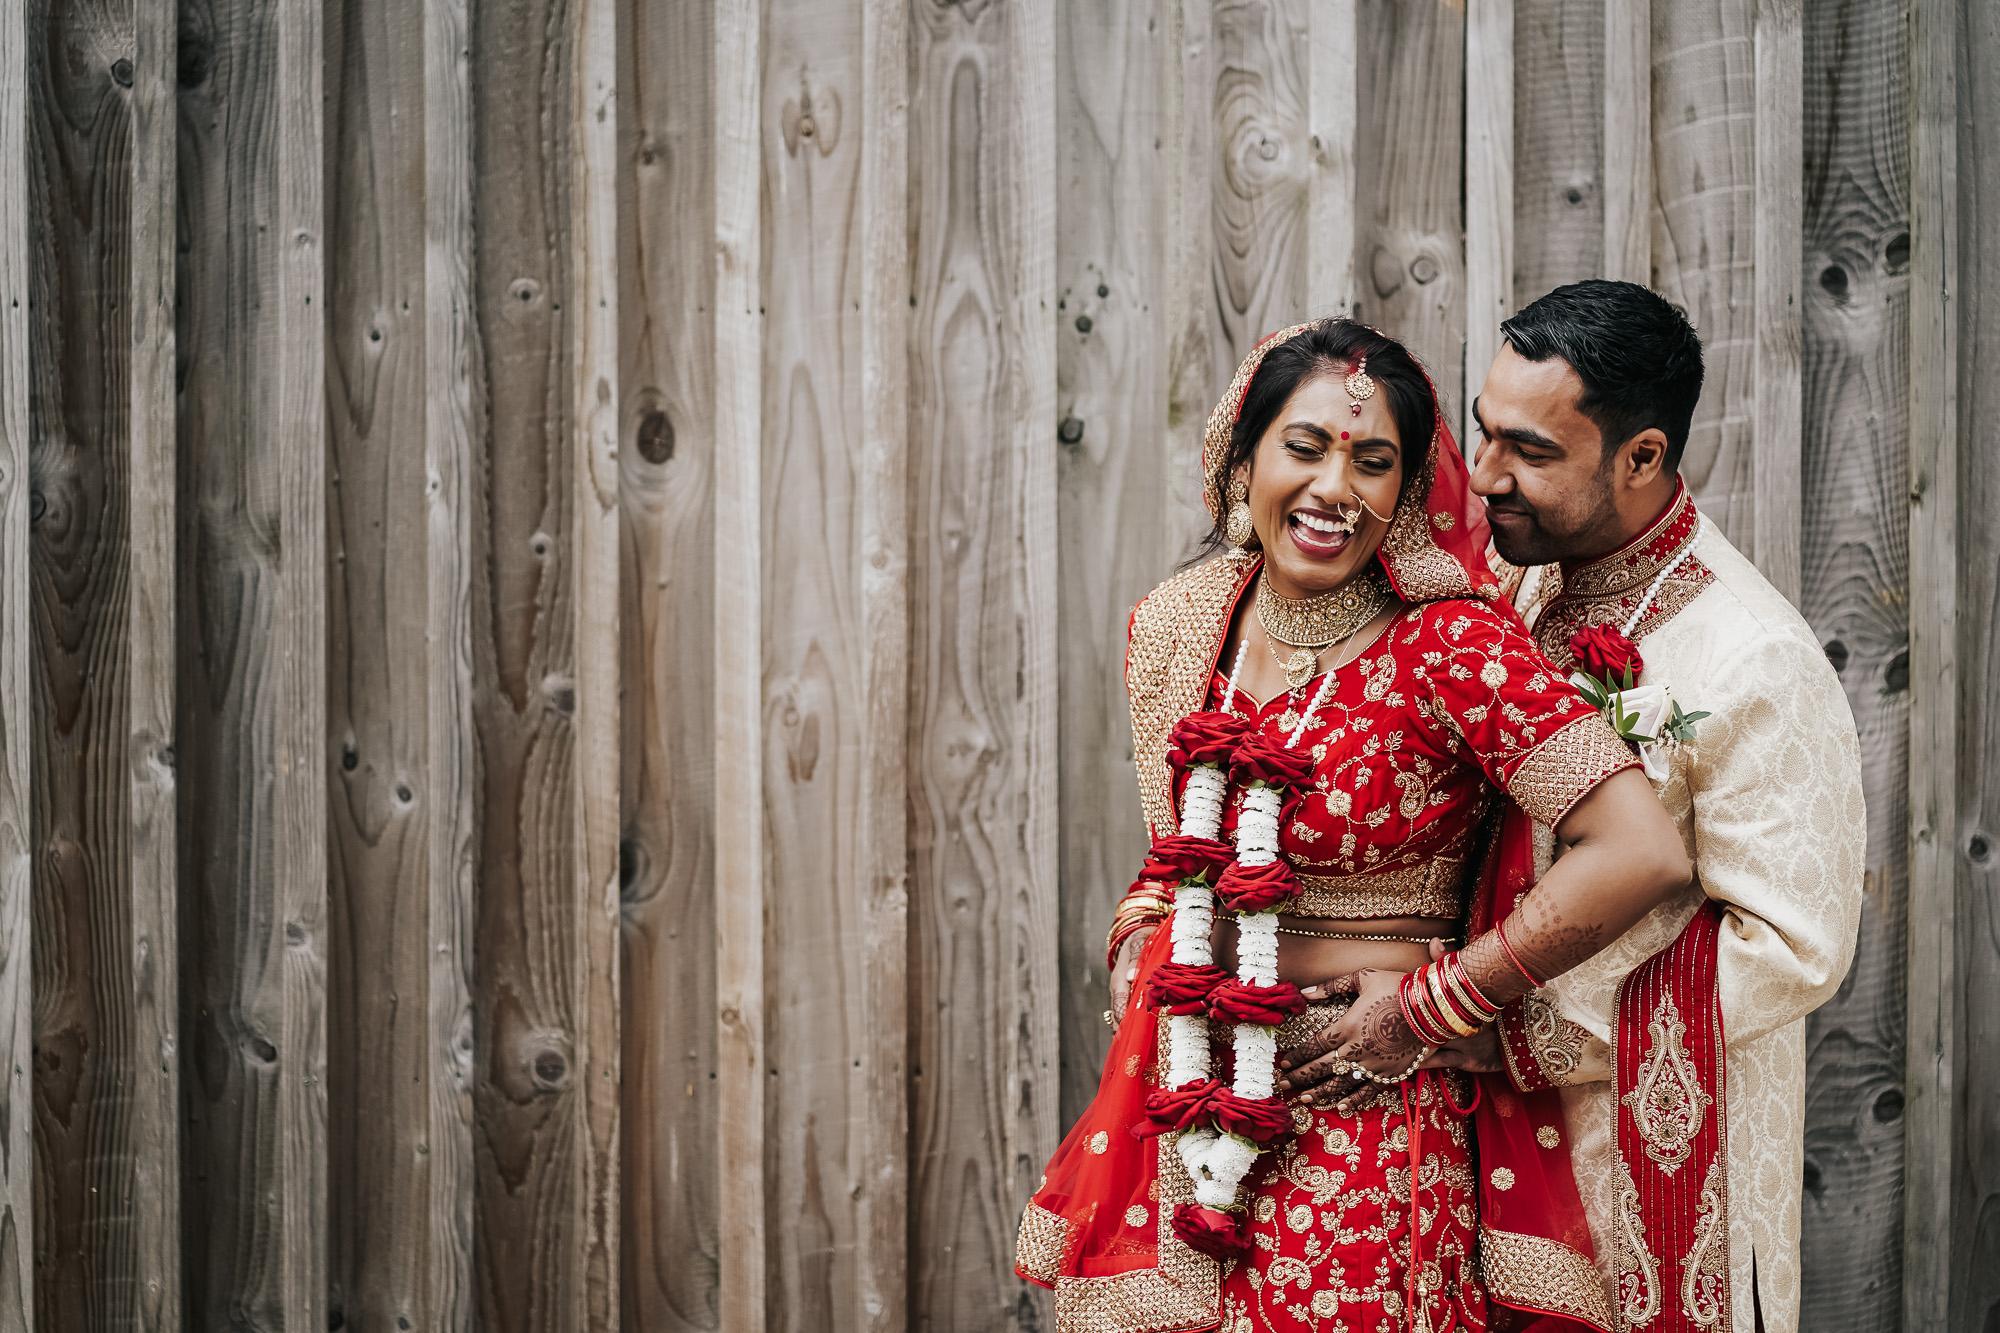 Alcumlow Hall Farm Indian Wedding Photographer (22 of 44).jpg